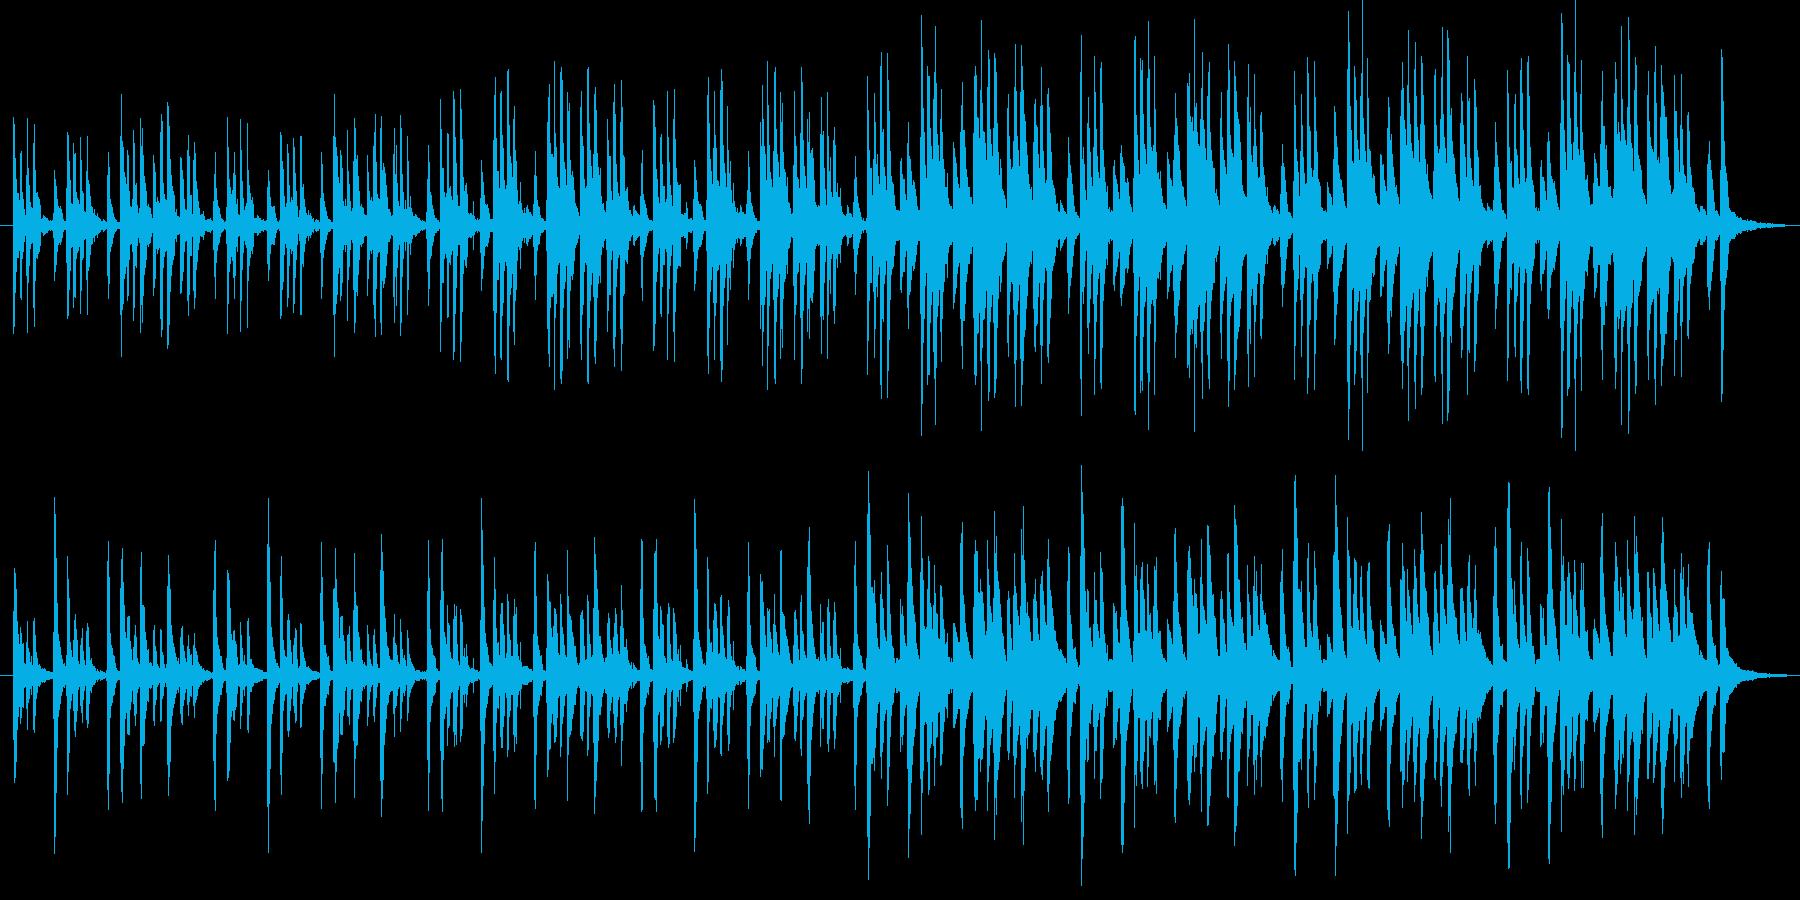 【POP ほのぼの系】ほのぼの系音楽の再生済みの波形